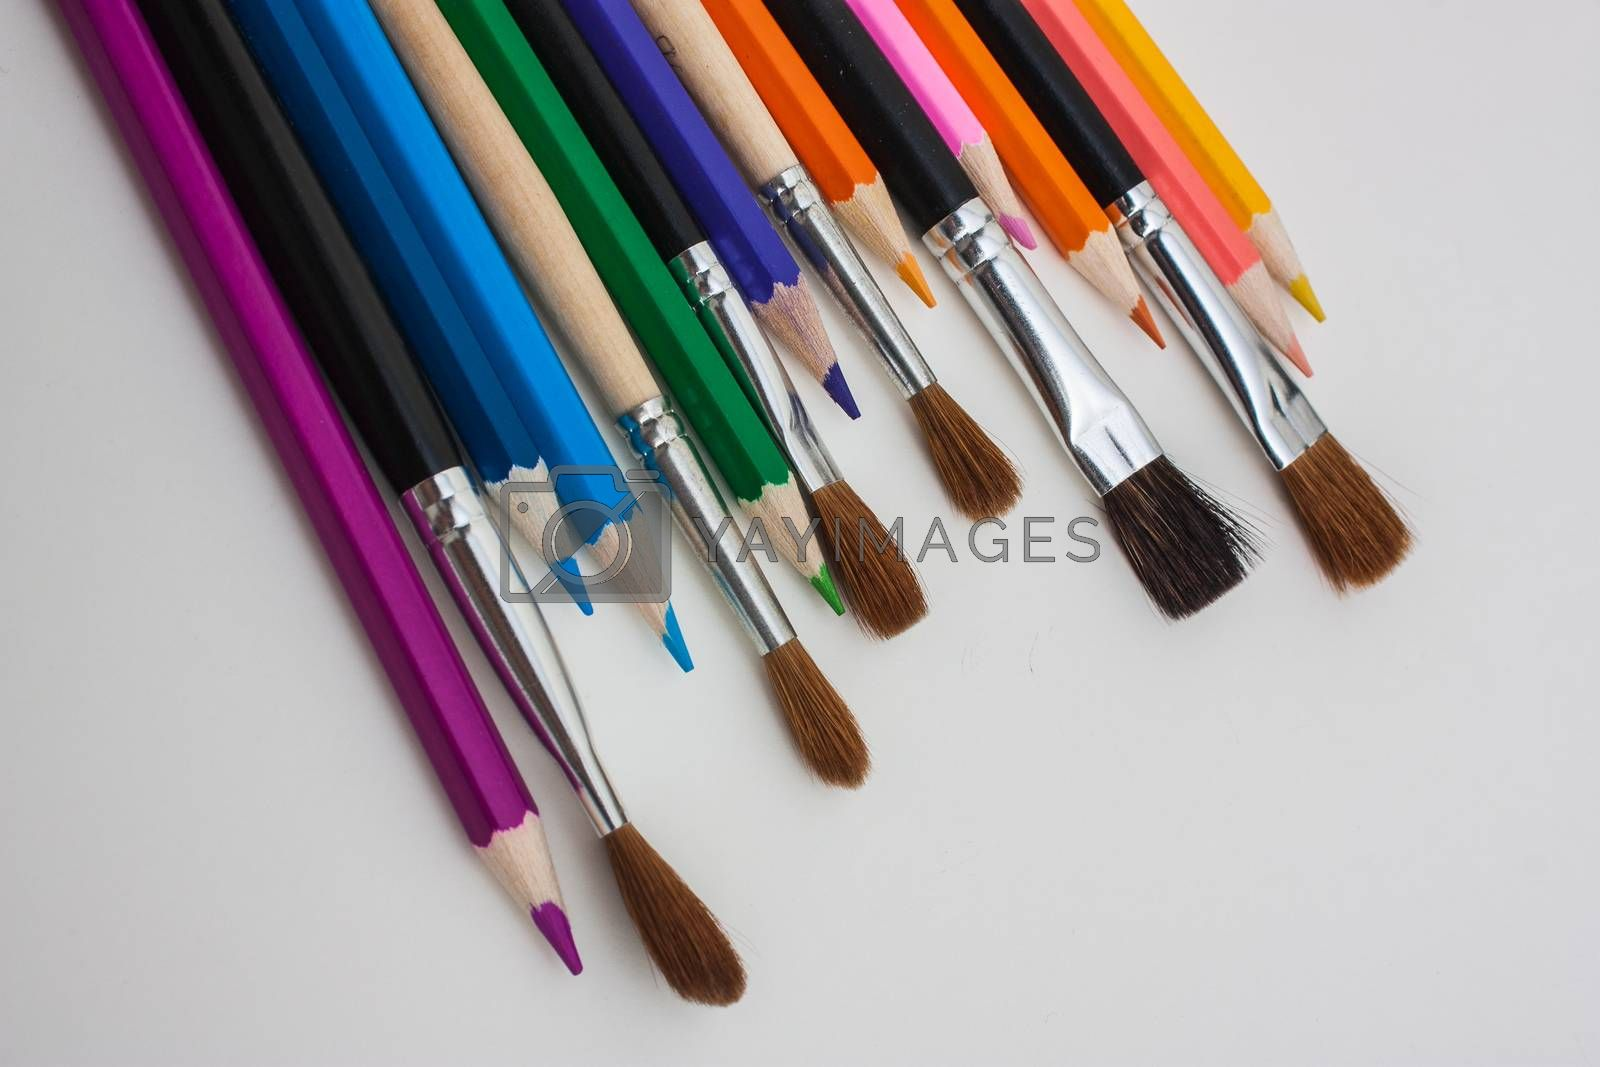 Royalty free image of drawing tools by oleg_zhukov